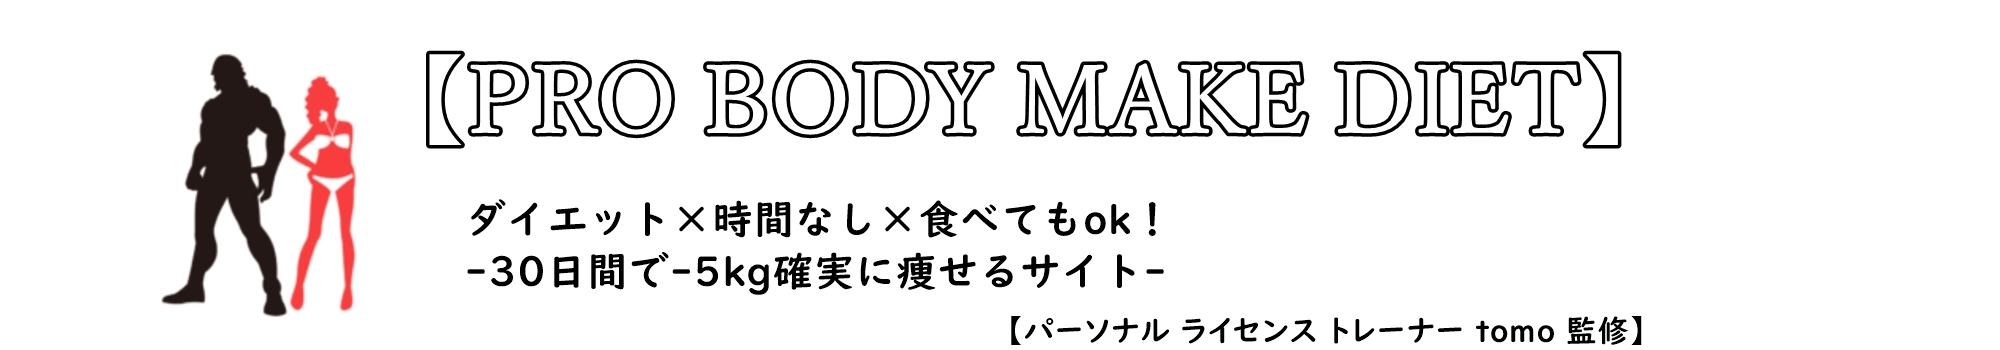 【PRO BODY MAKE DIET】30日間で‐5kg痩せるサイト。